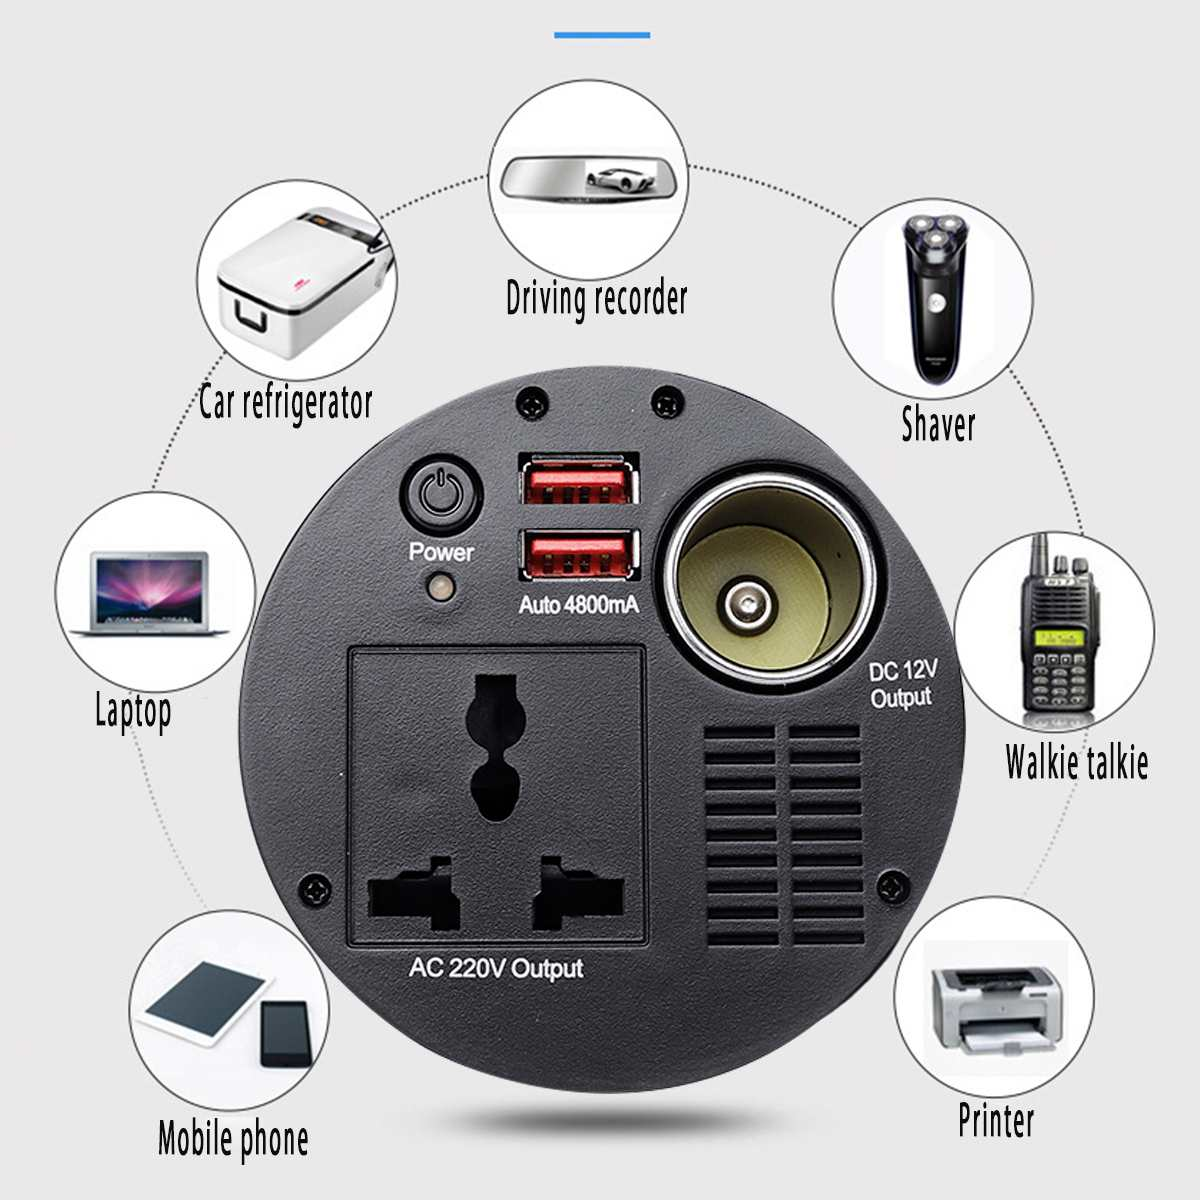 Auto Inverter 150W Tasse-förmigen DC 12V zu 220V Protable Spannung transformator Power Inverter Konverter Adapter sinus Welle 2 USB